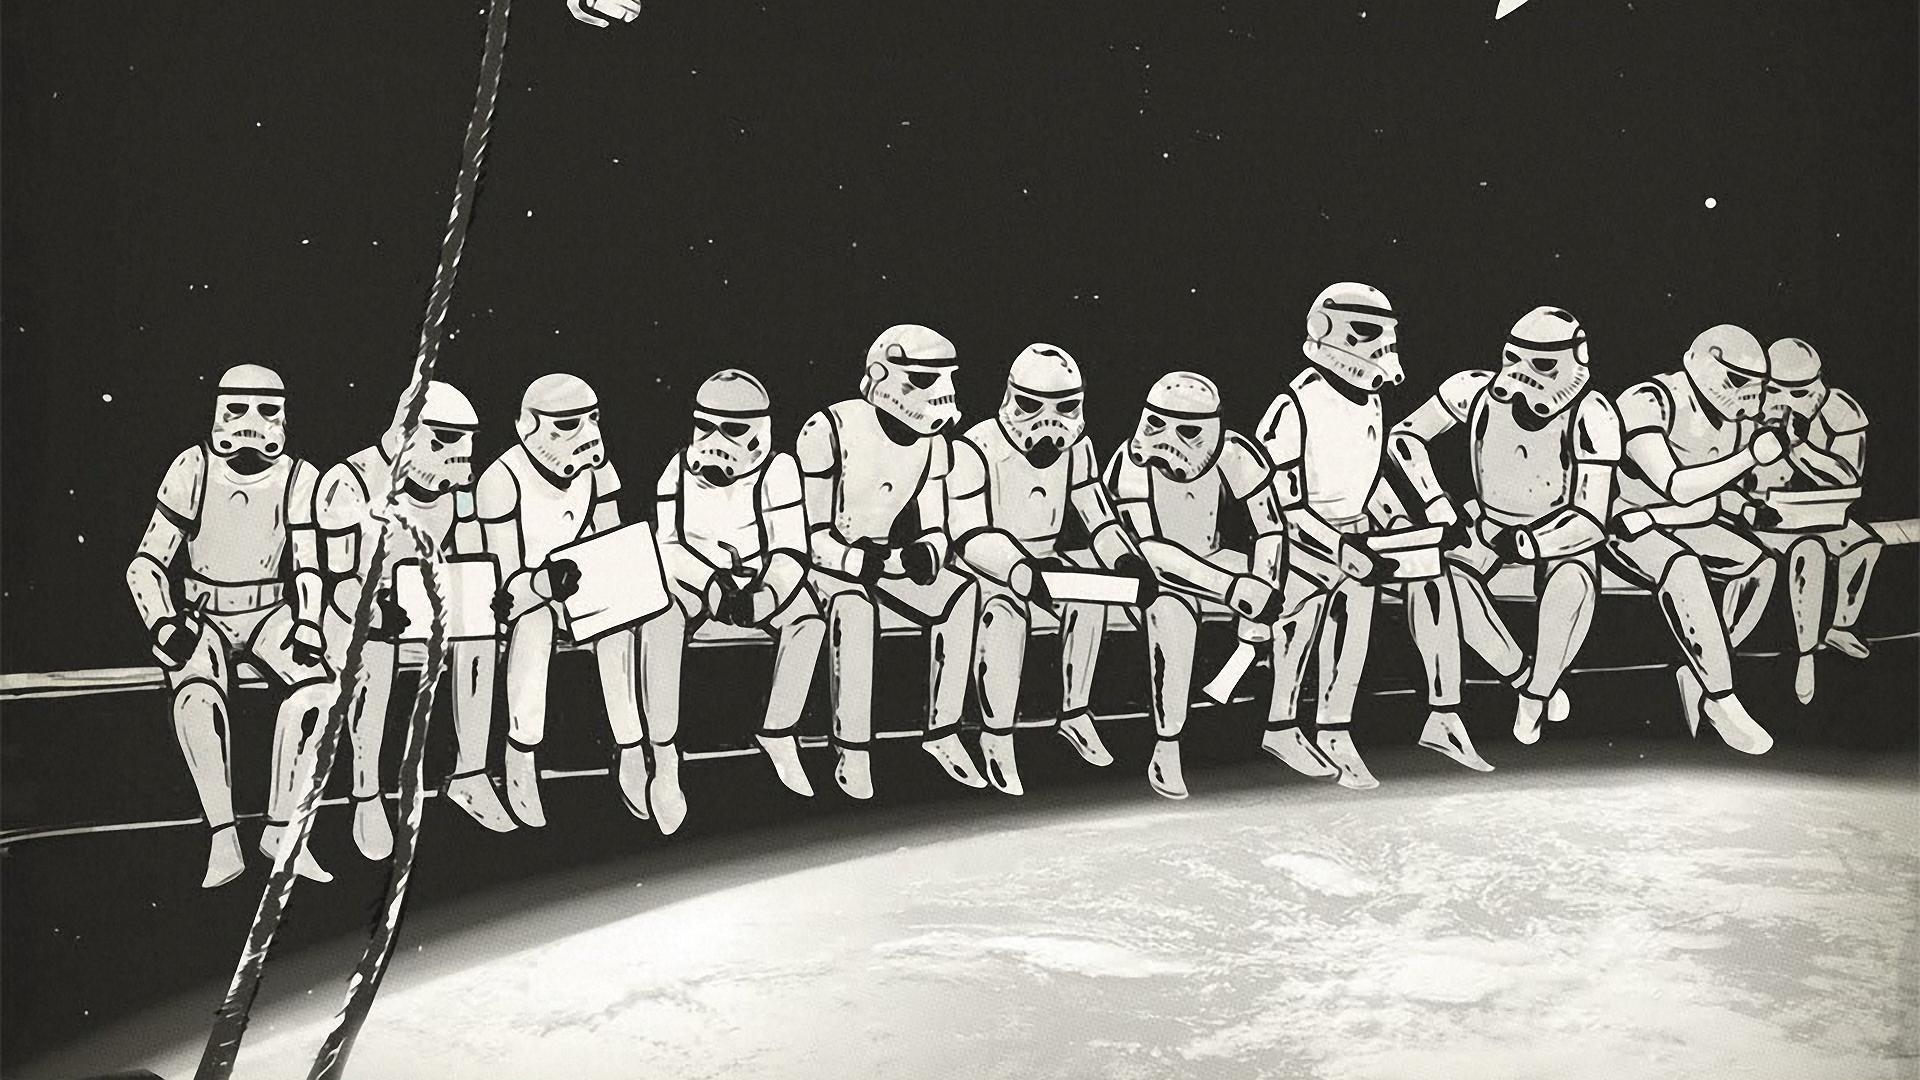 Wallpaper Star Wars Team Stormtrooper Art 1920x1080 Px Black